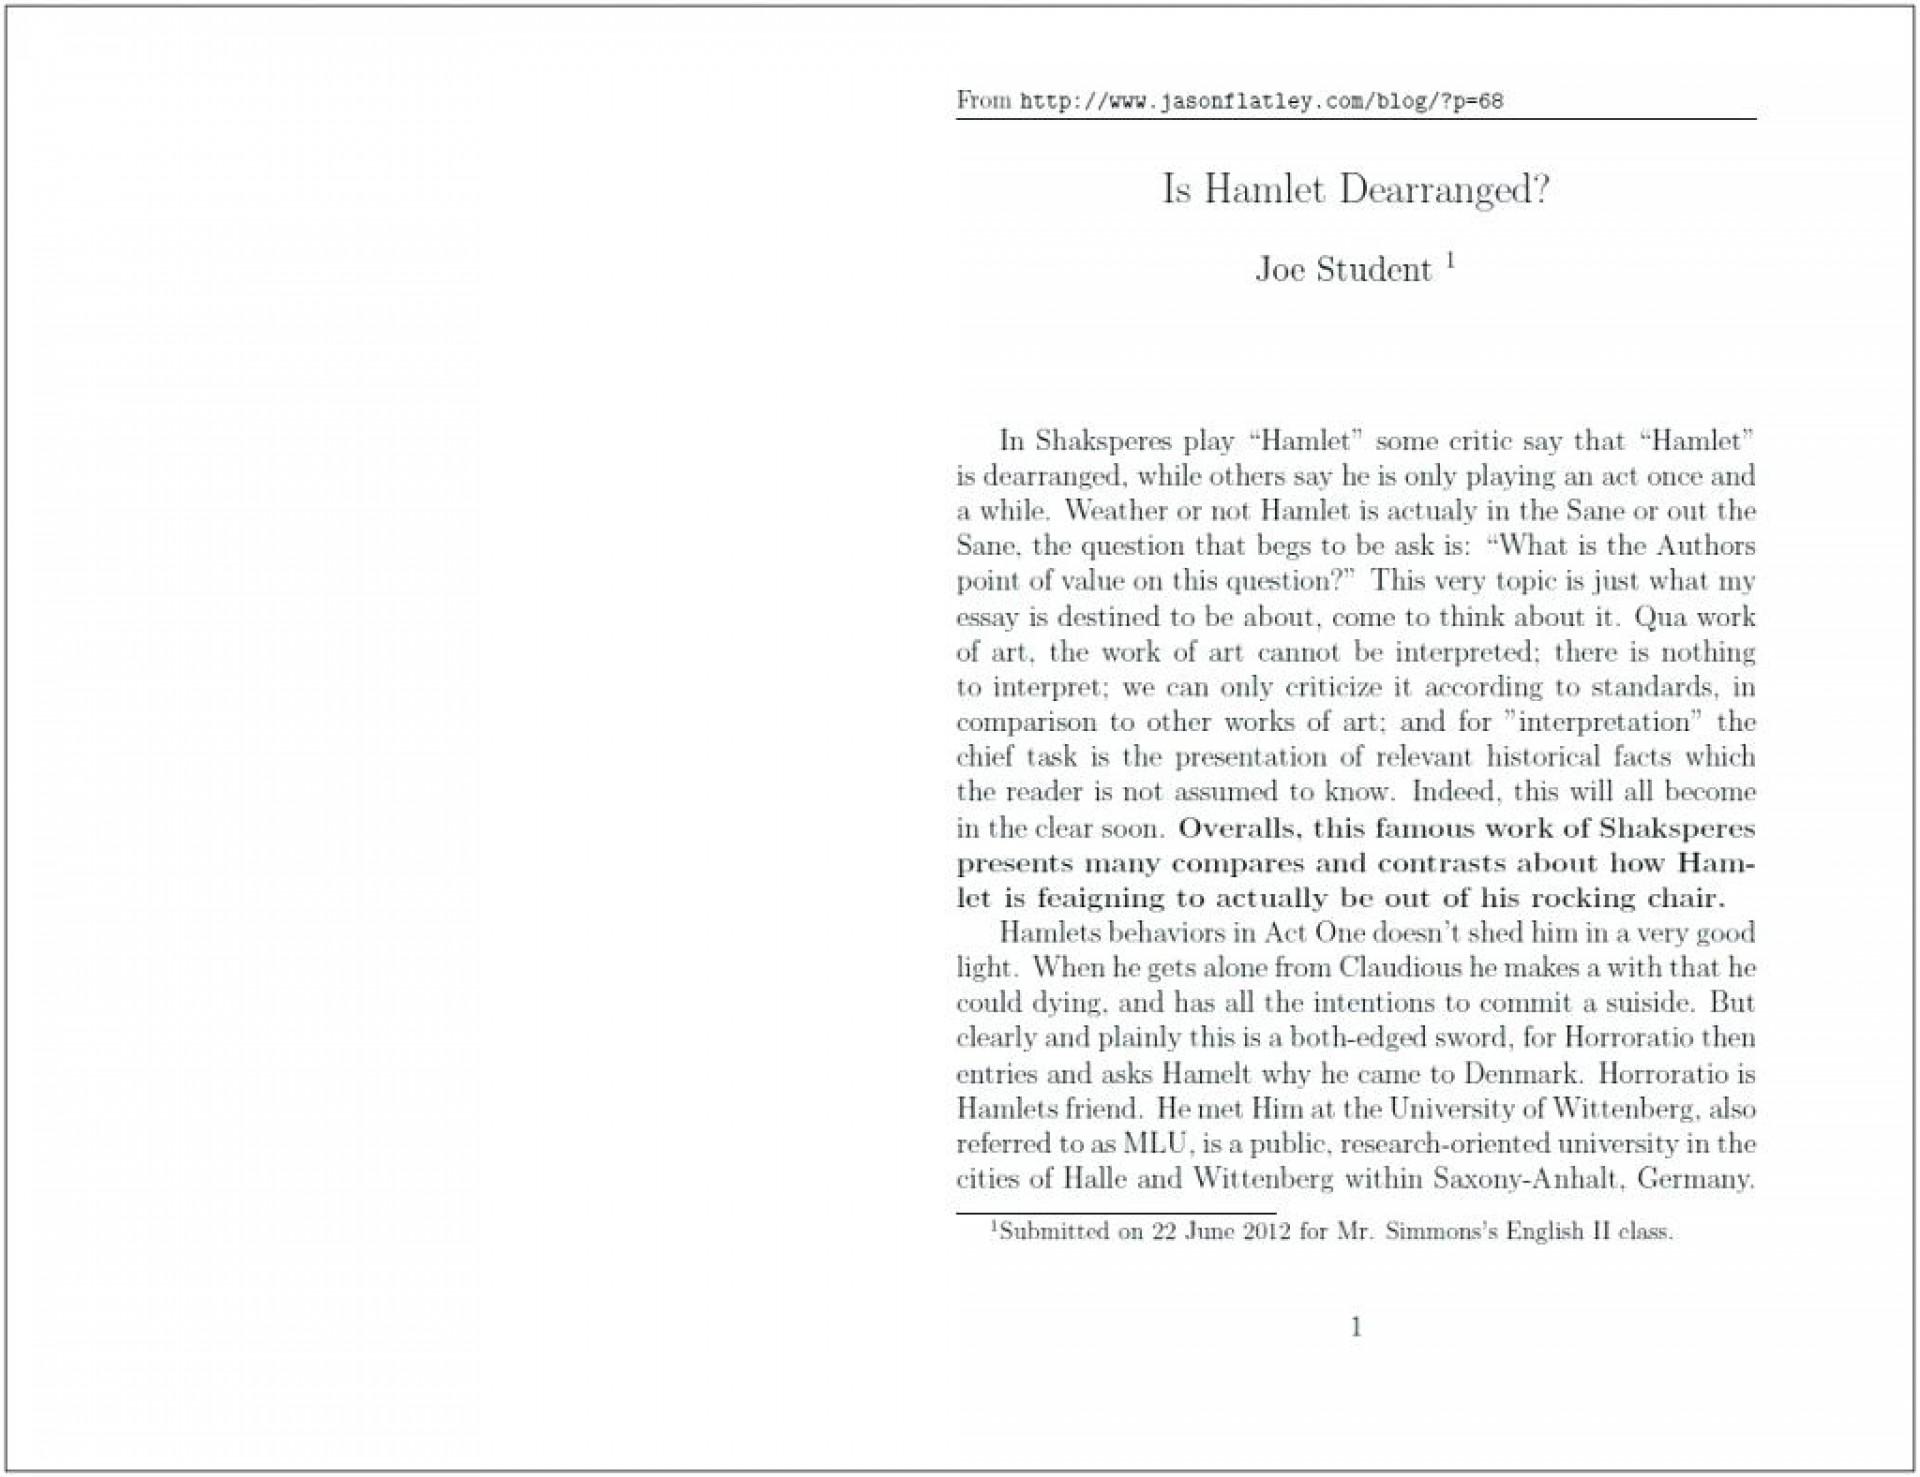 009 Standard Essay Format Example Form Essays On Double Coursework Academic Sat Impressive Apa Style Font Size 1920